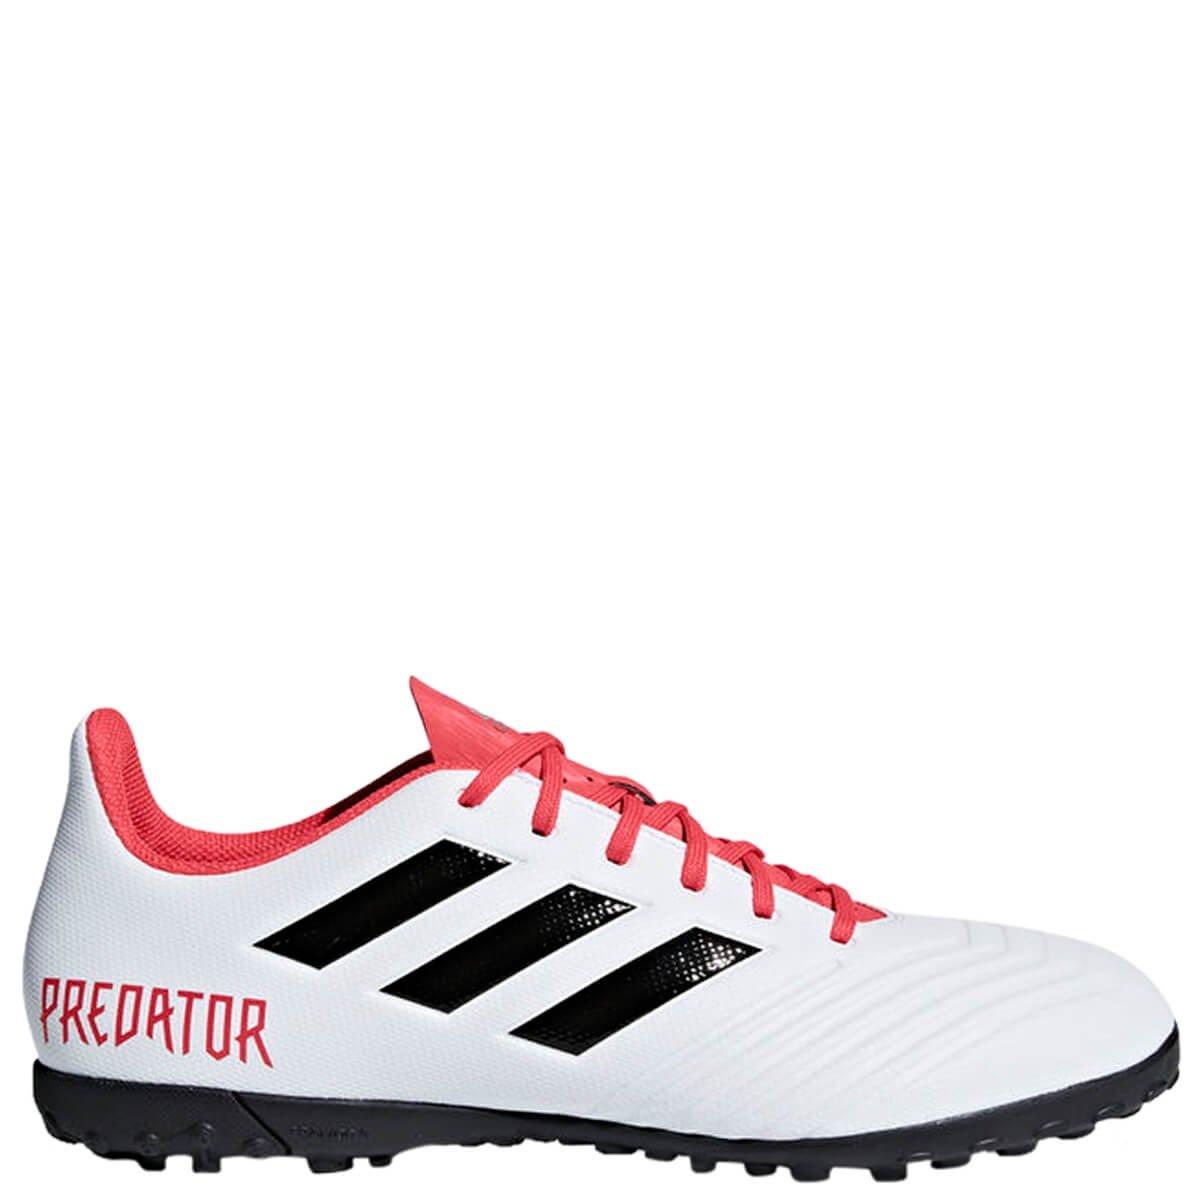 4b69eefb0683c Bizz Store - Chuteira Society Masculina Adidas Predator 18.4